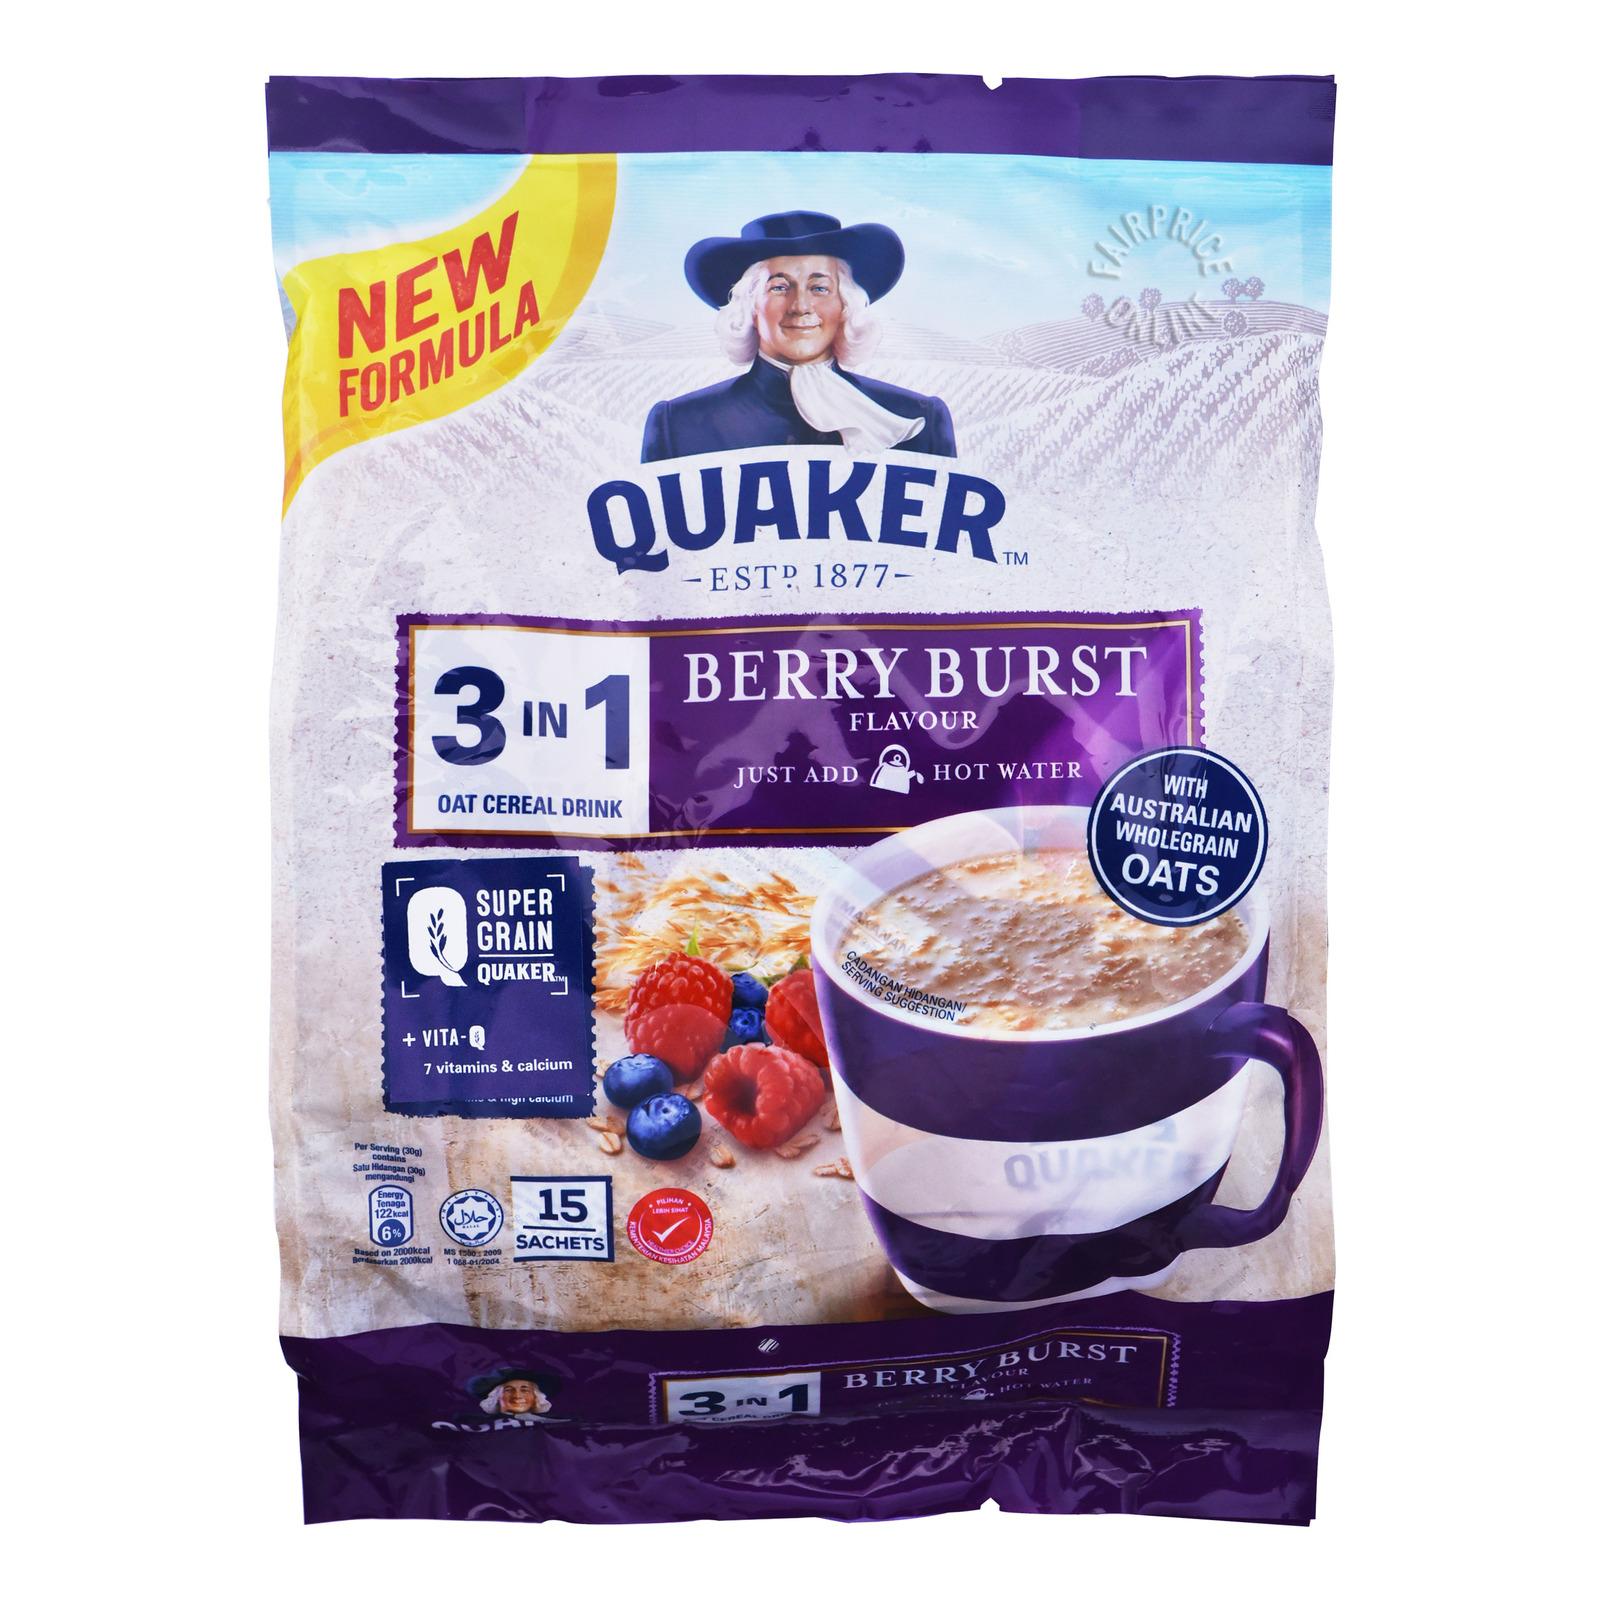 Quaker 3 in 1 Instant Oat Cereal Drink - Berry Burst